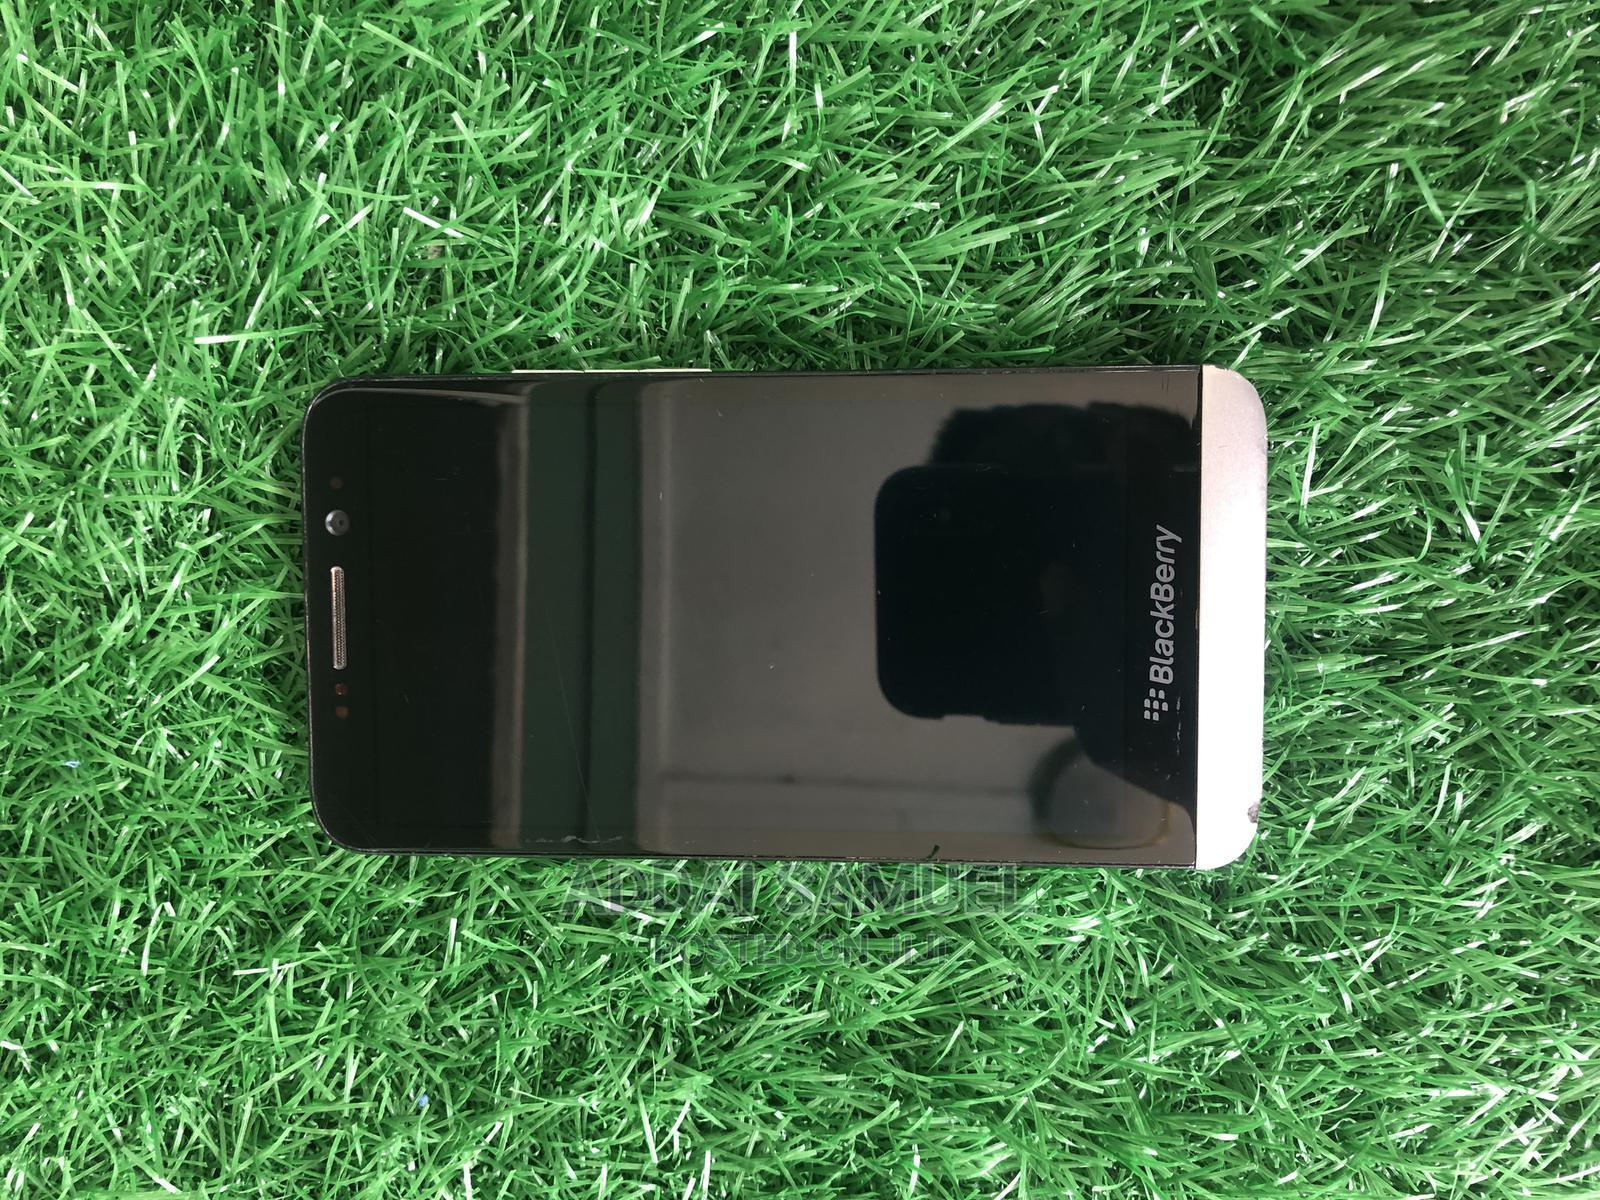 BlackBerry Z30 16 GB Black   Mobile Phones for sale in Kumasi Metropolitan, Ashanti, Ghana